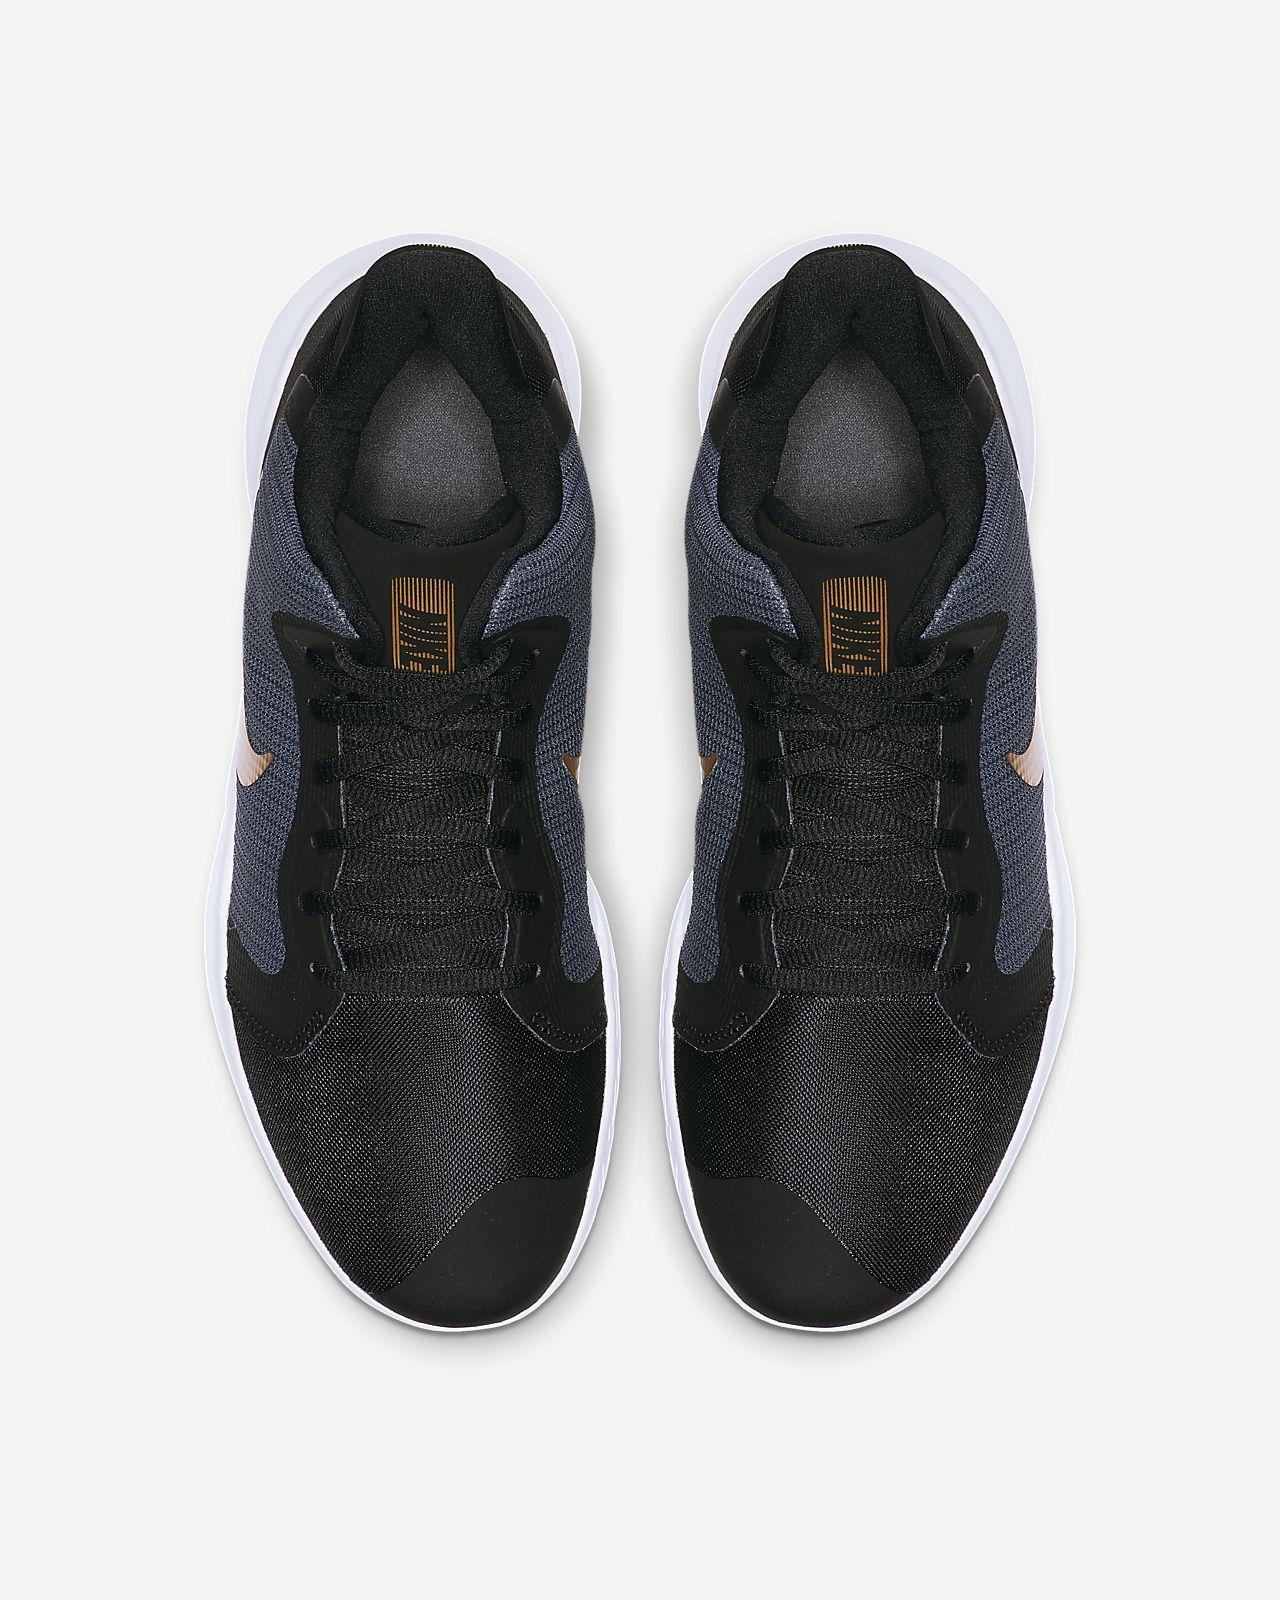 23a5155d2b73 Low Resolution Nike Precision III Basketball Shoe Nike Precision III  Basketball Shoe